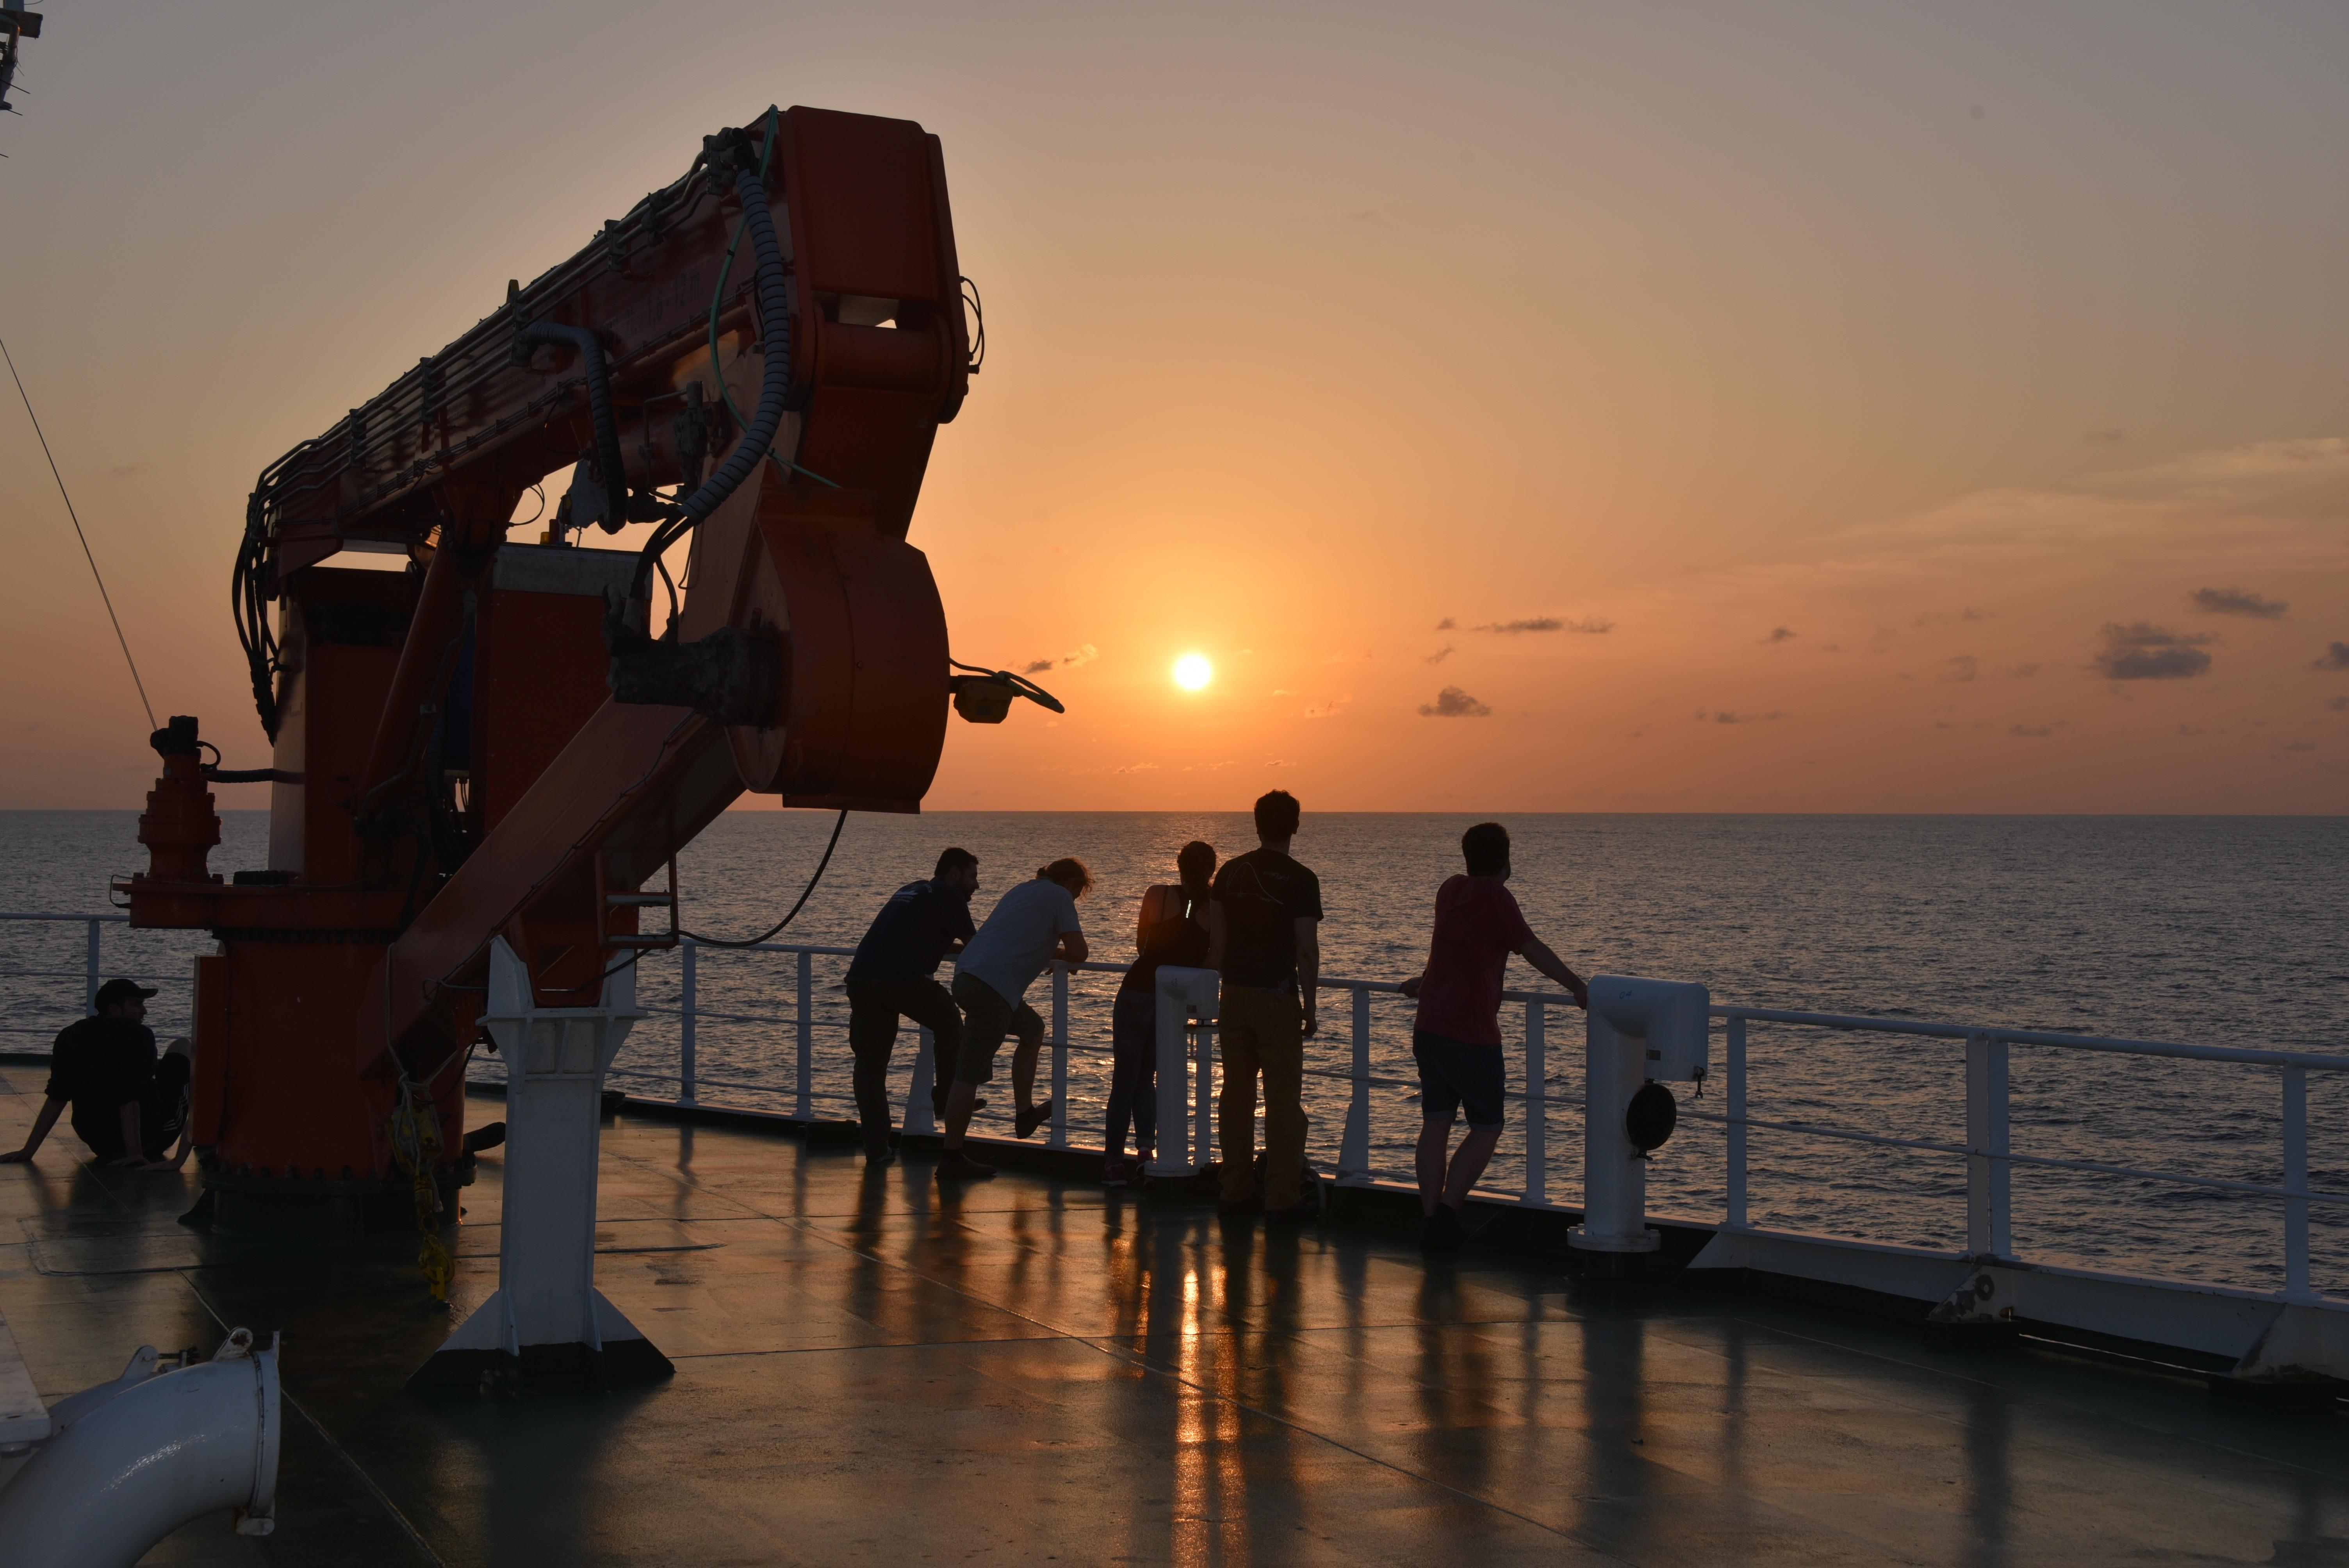 Di atas kapal ekspedisi. Foto: Universitas Southampton